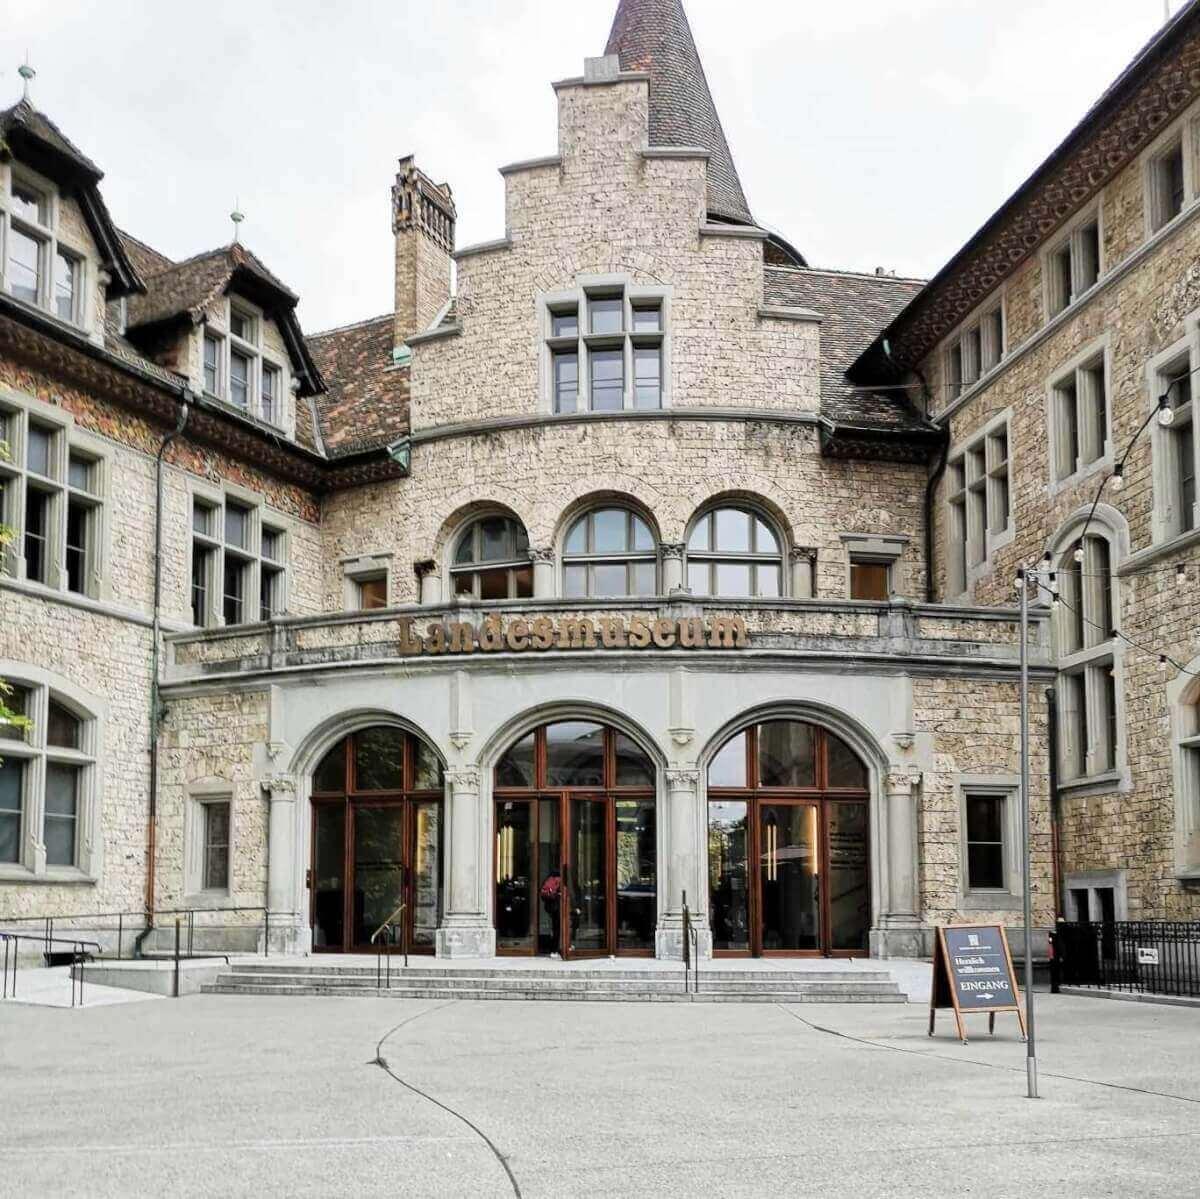 Landesmuseum Zurich's national museum